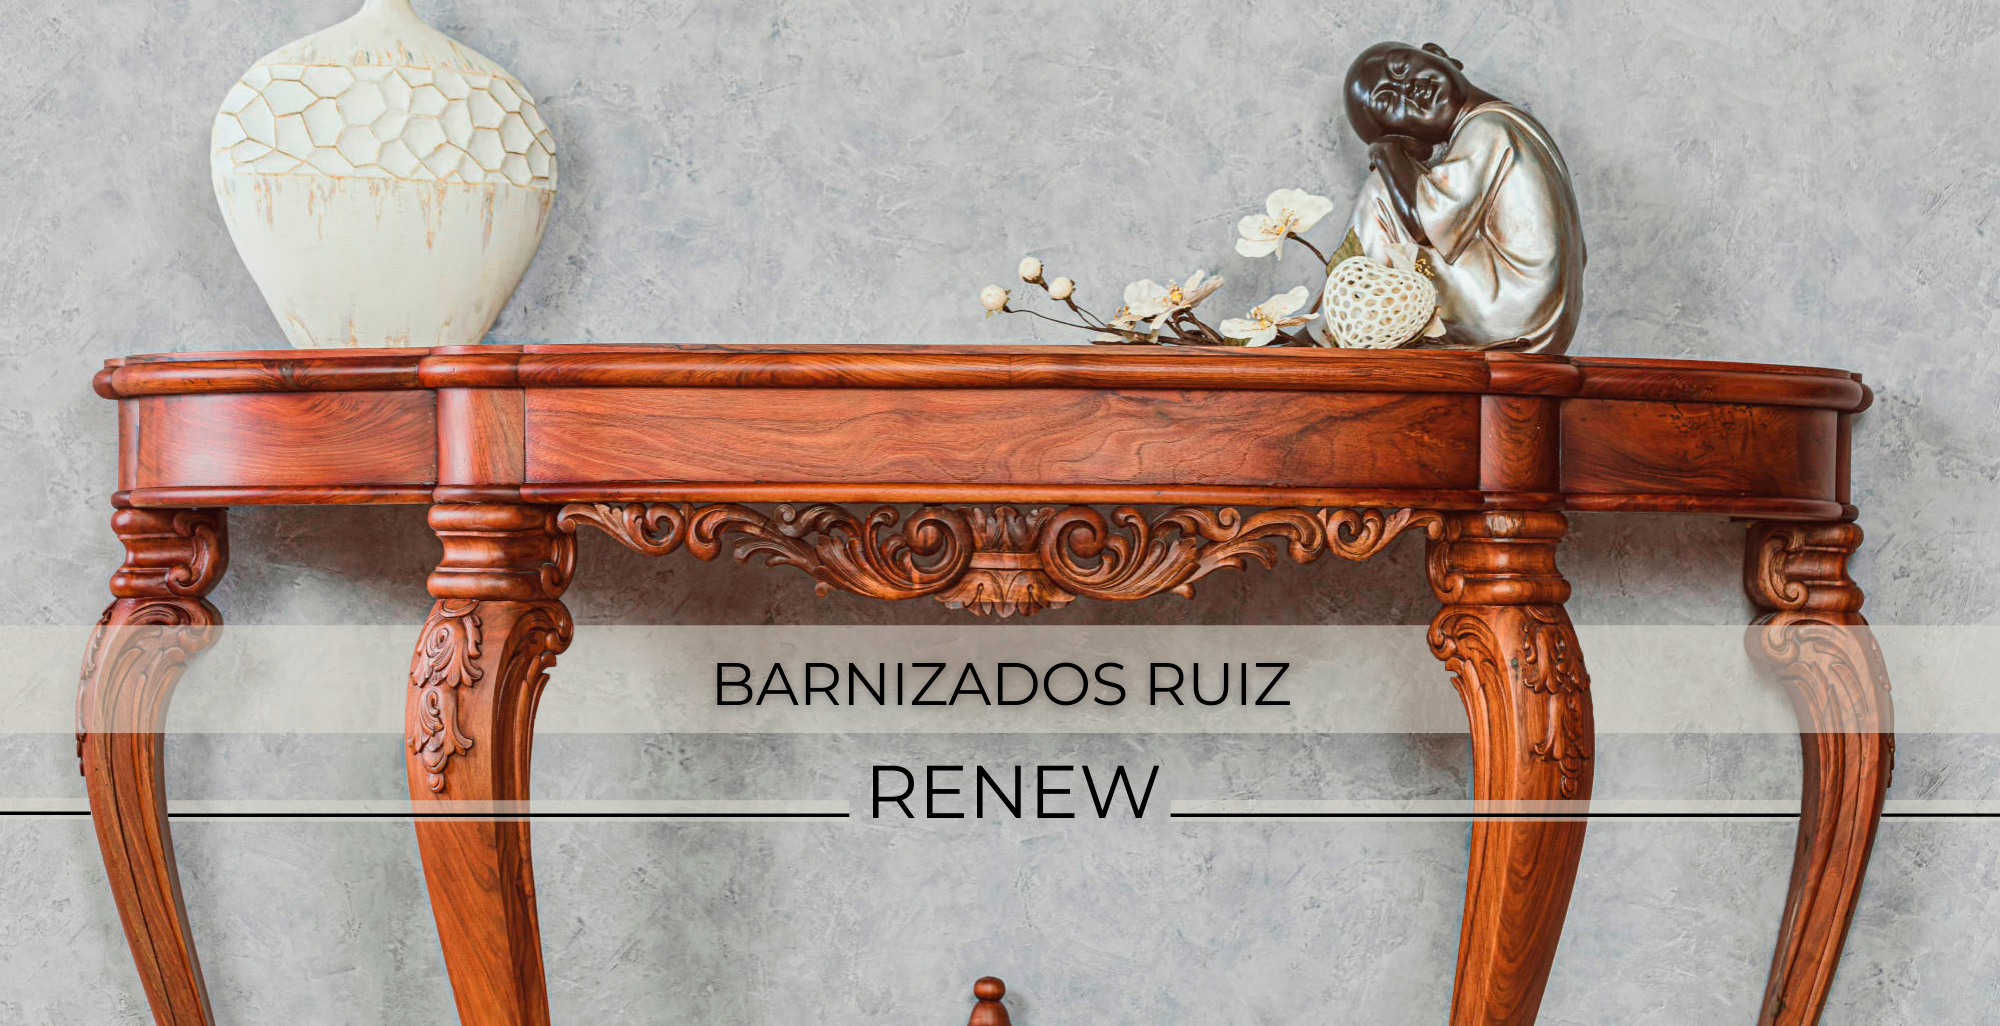 BARNIZADOS RUIZ | RENEW